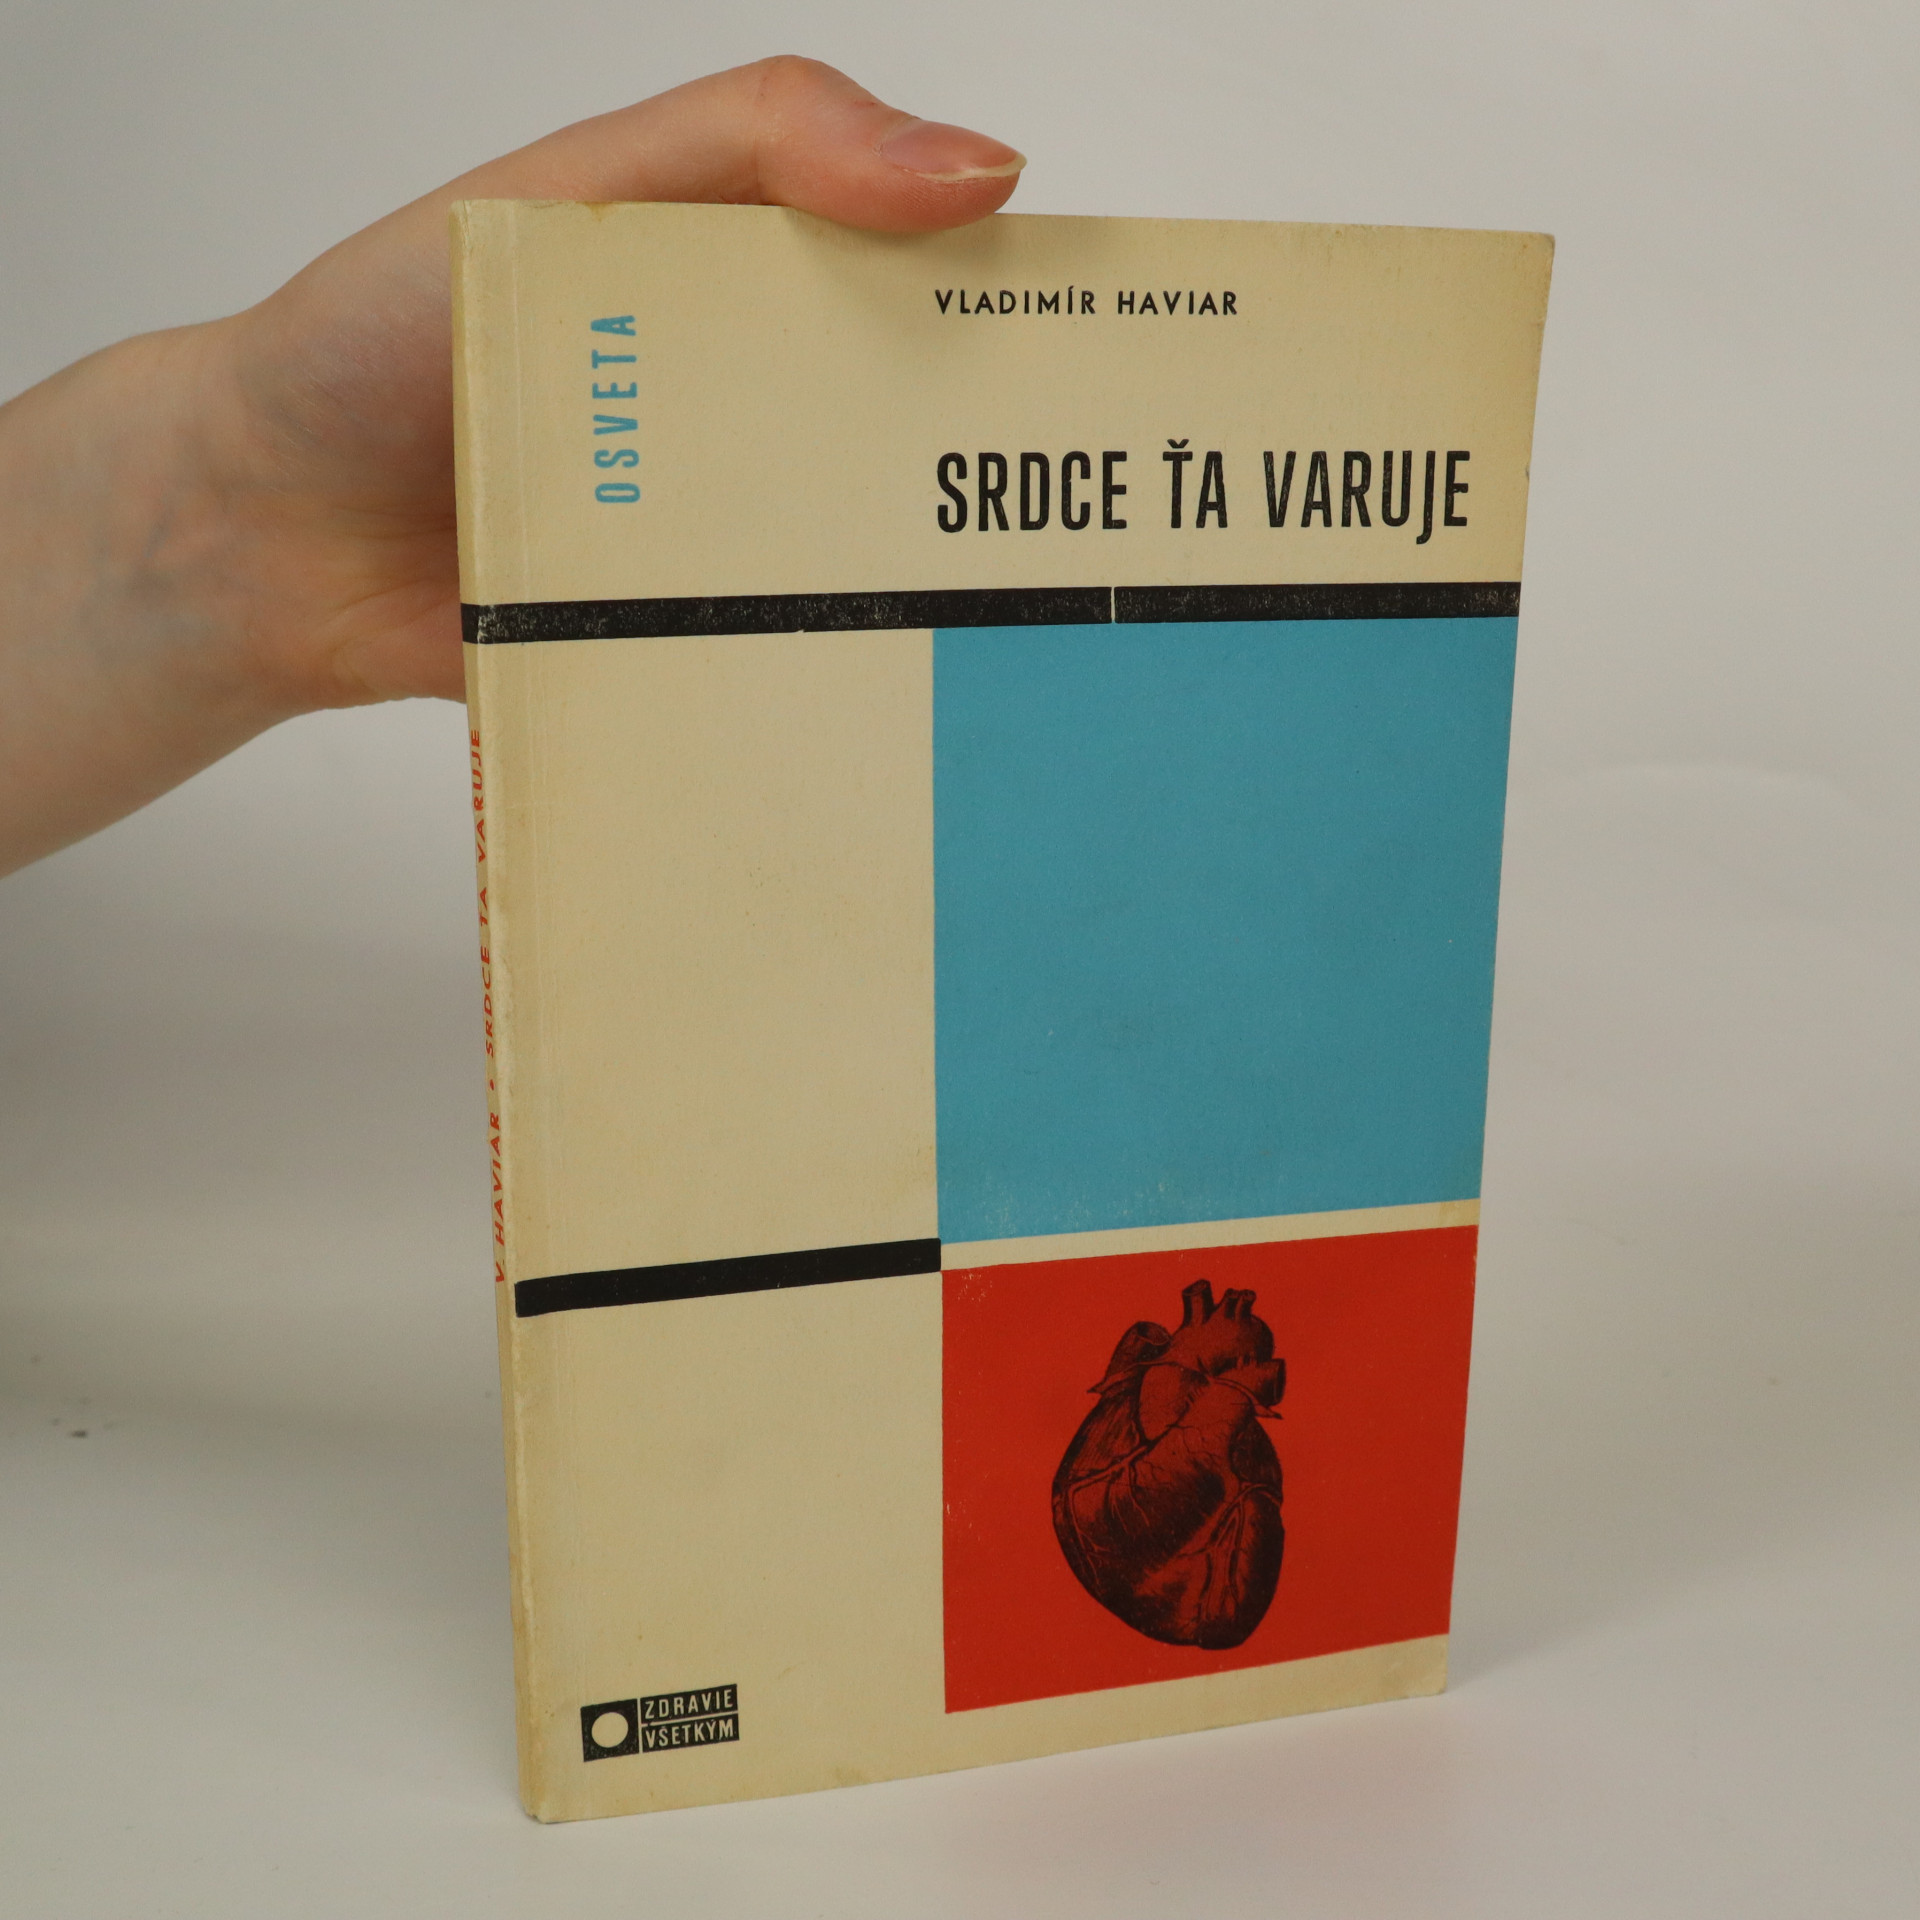 antikvární kniha Srdce ťa varuje, 1969